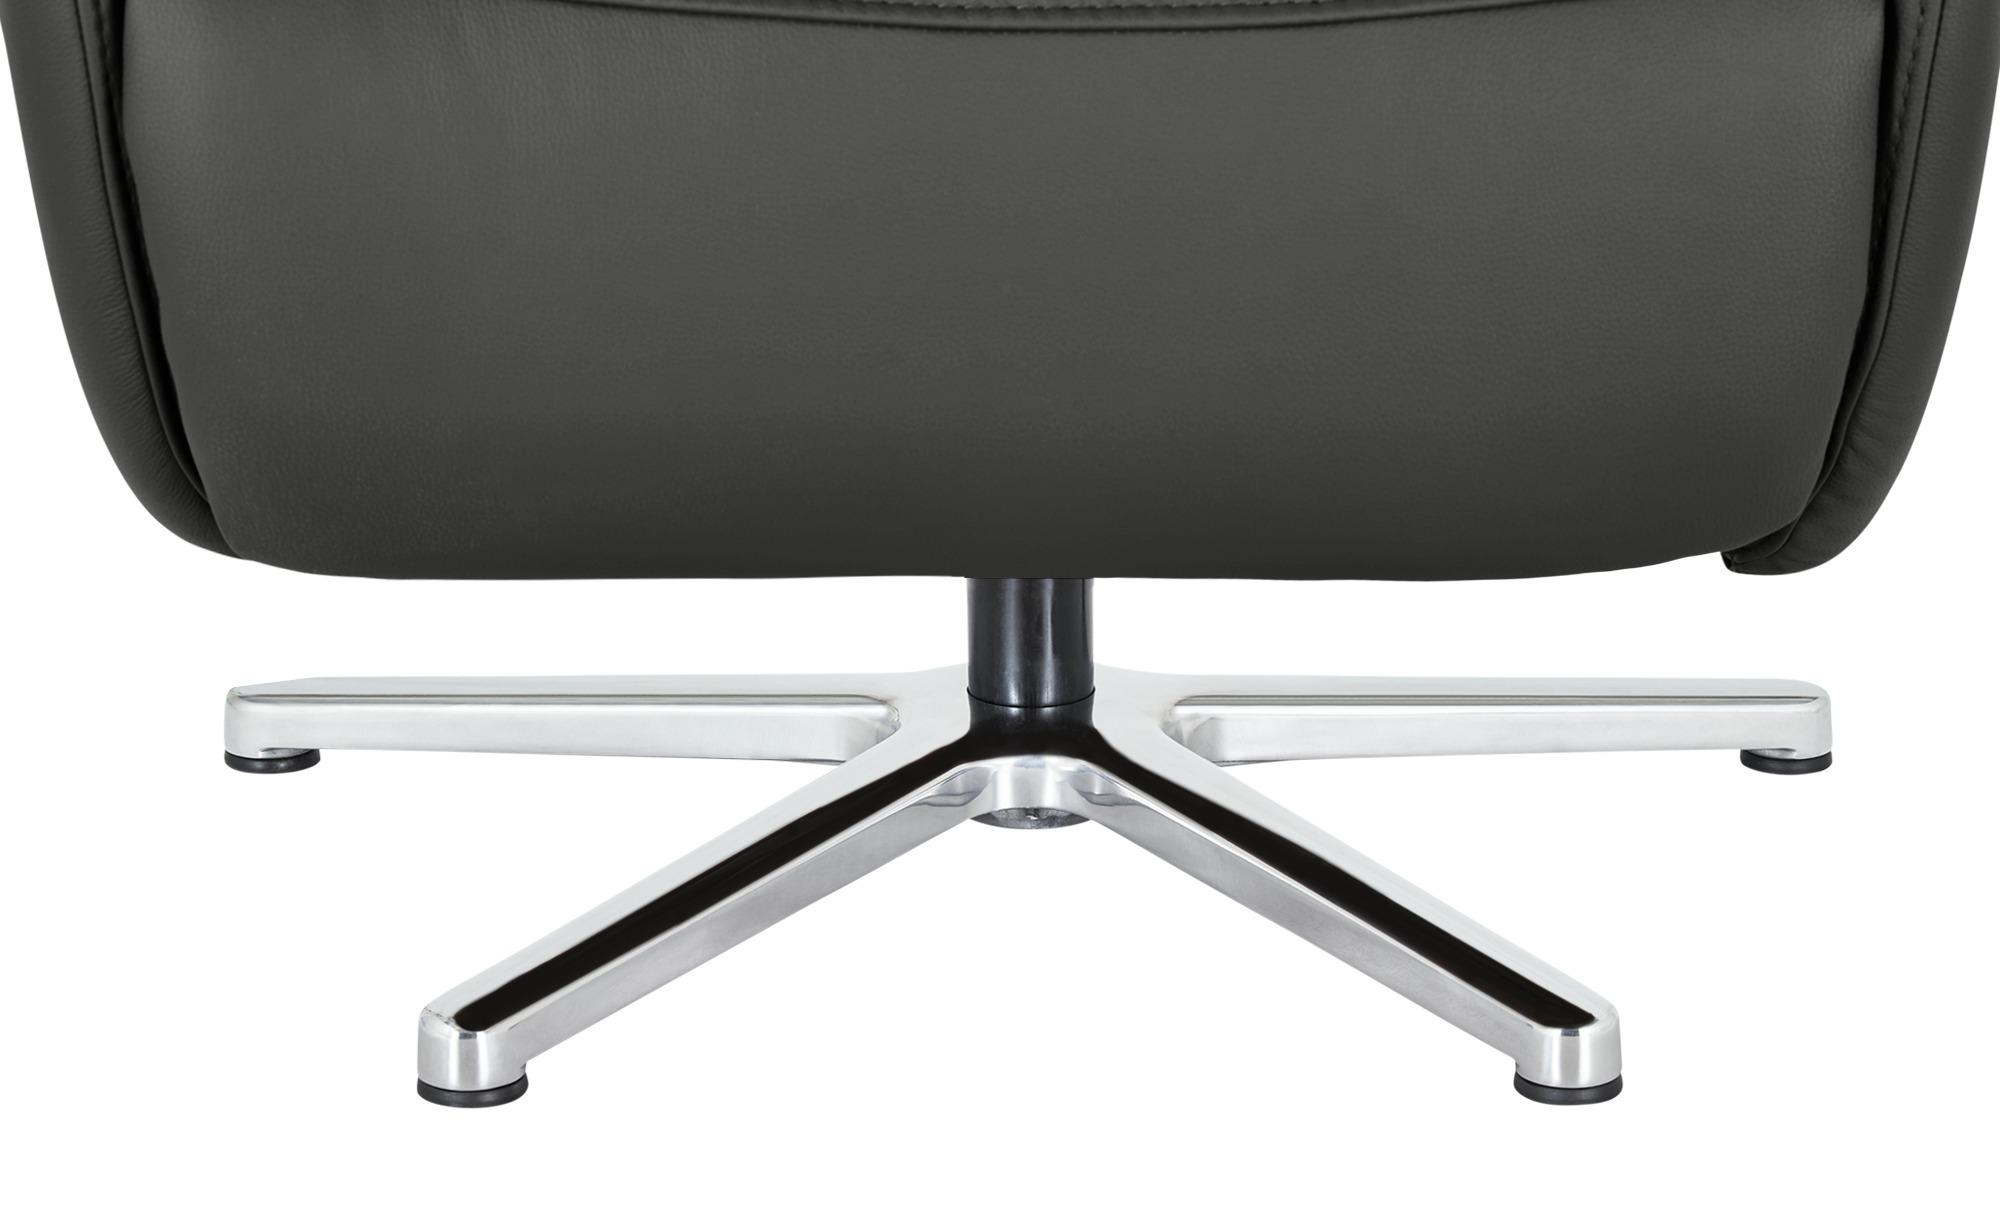 Hukla Relaxsessel  Enno ¦ schwarz ¦ Maße (cm): B: 72 H: 110 T: 85 Polstermöbel > Sessel > Fernsehsessel - Höffner